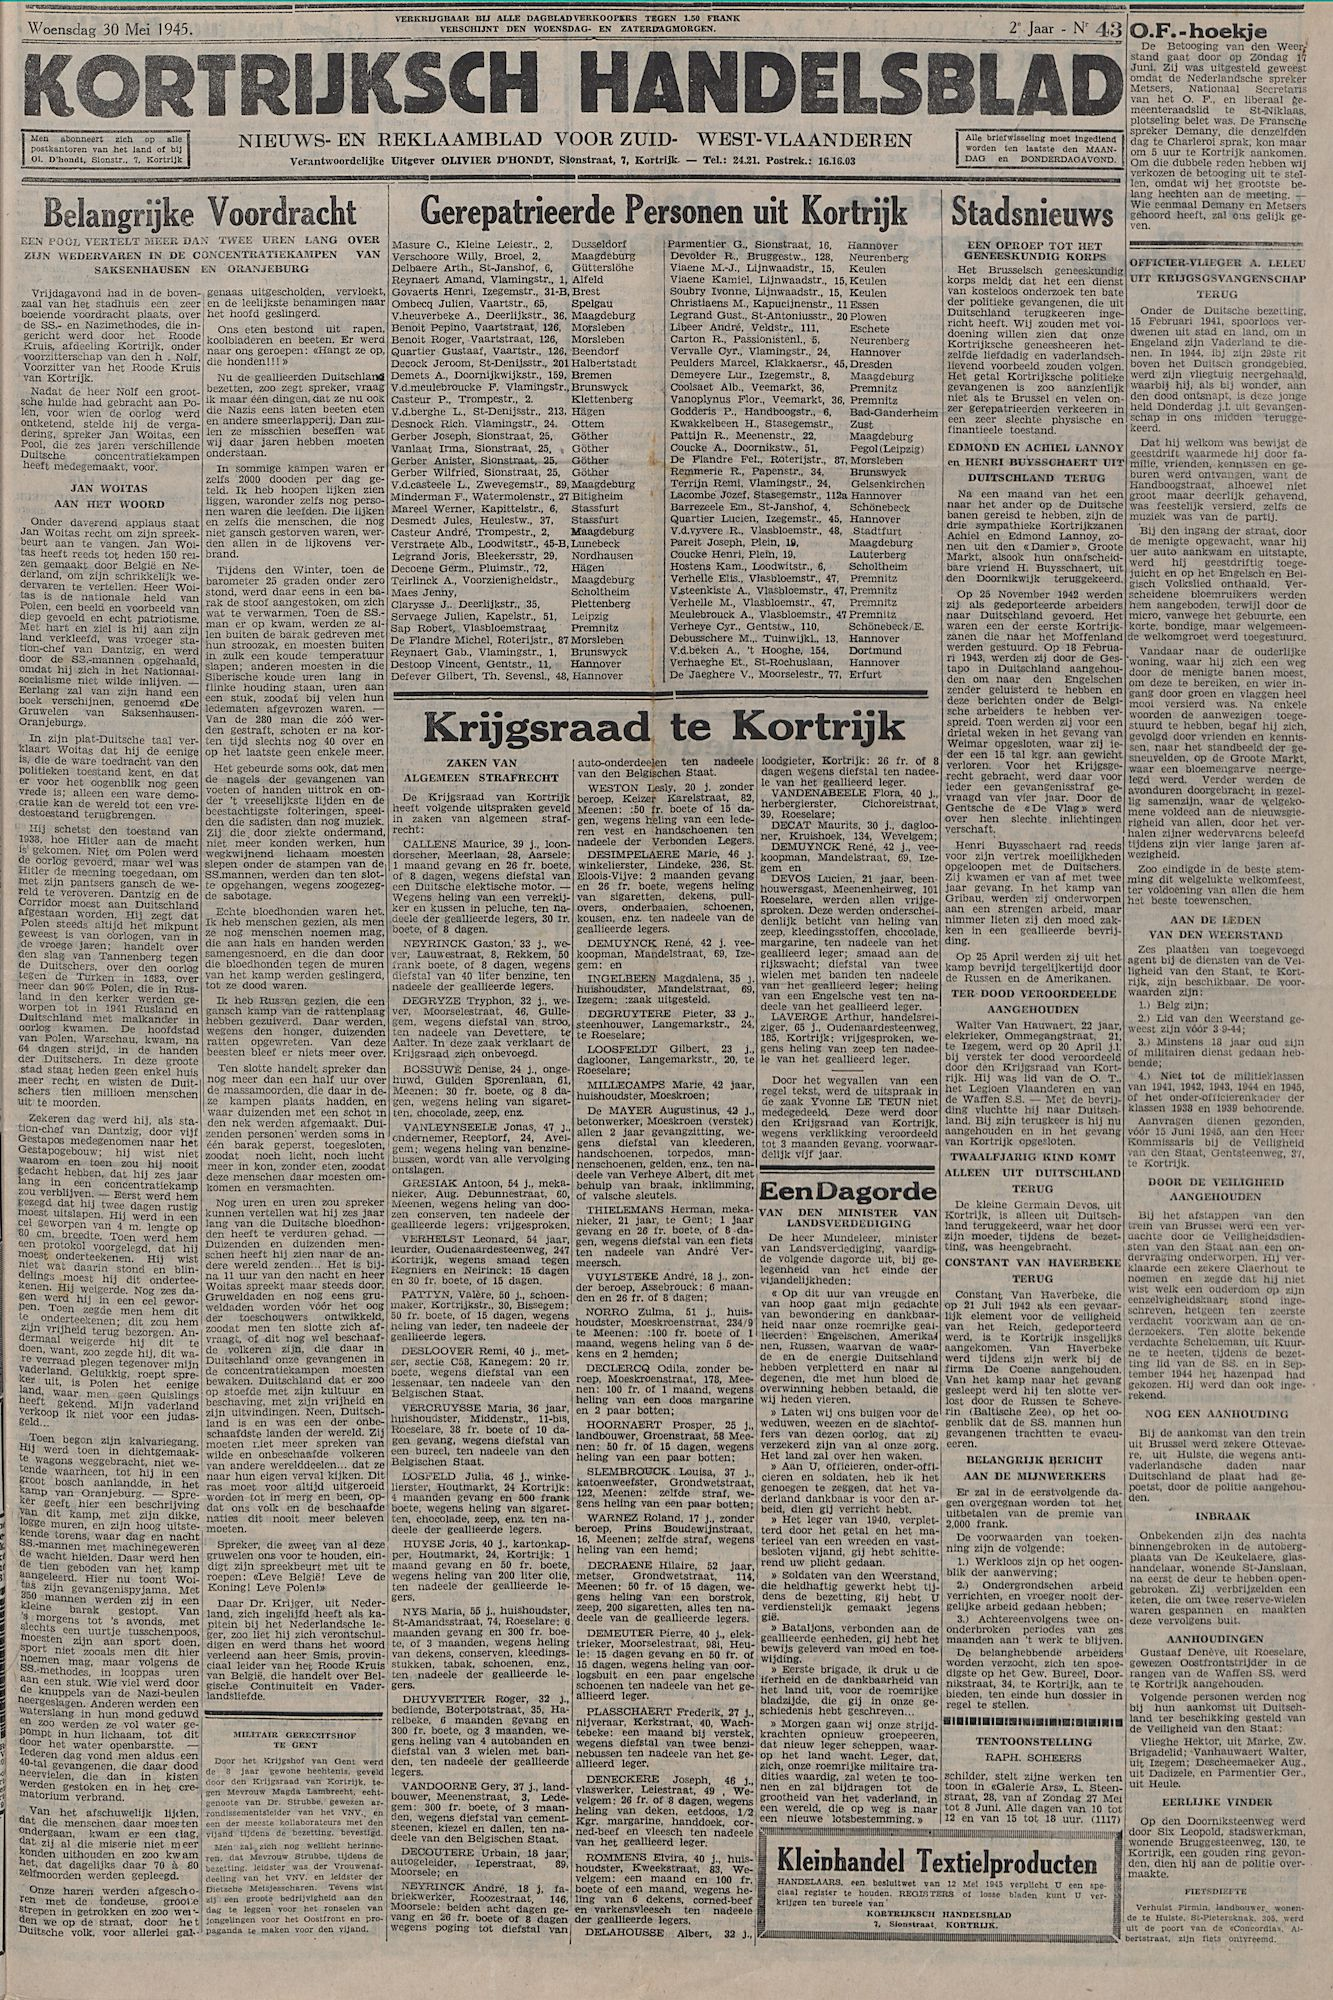 Kortrijksch Handelsblad 30 mei 1945 Nr43 p1